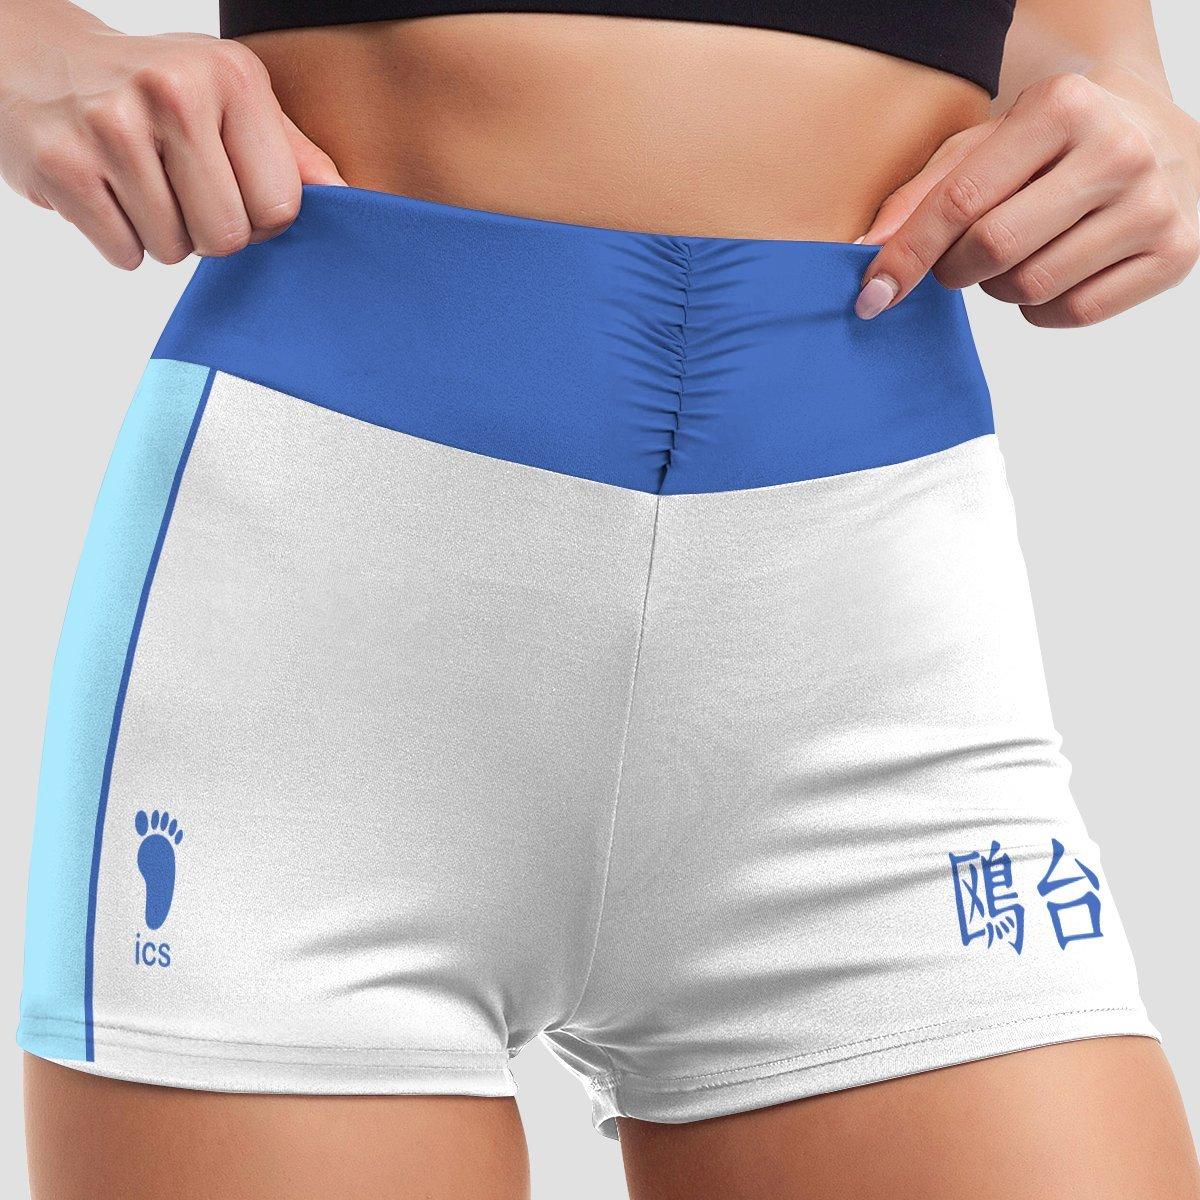 team kamomedai active wear set 525504 - Anime Swimsuits